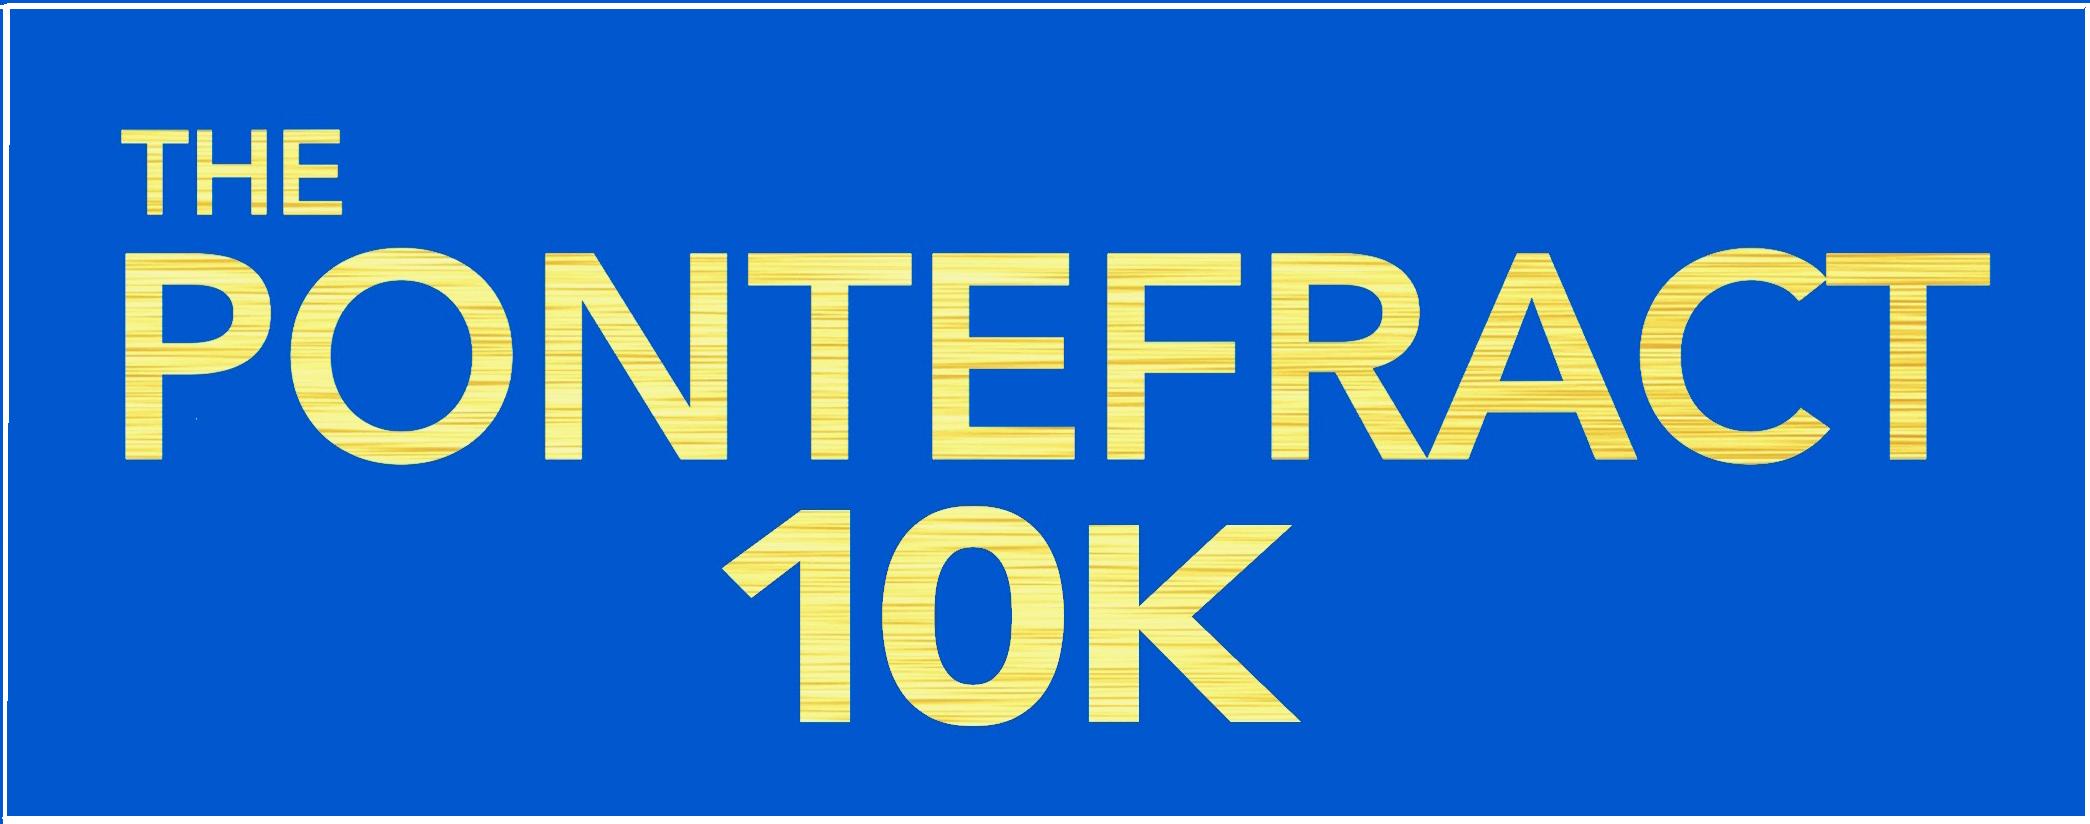 The Pontefract 10k